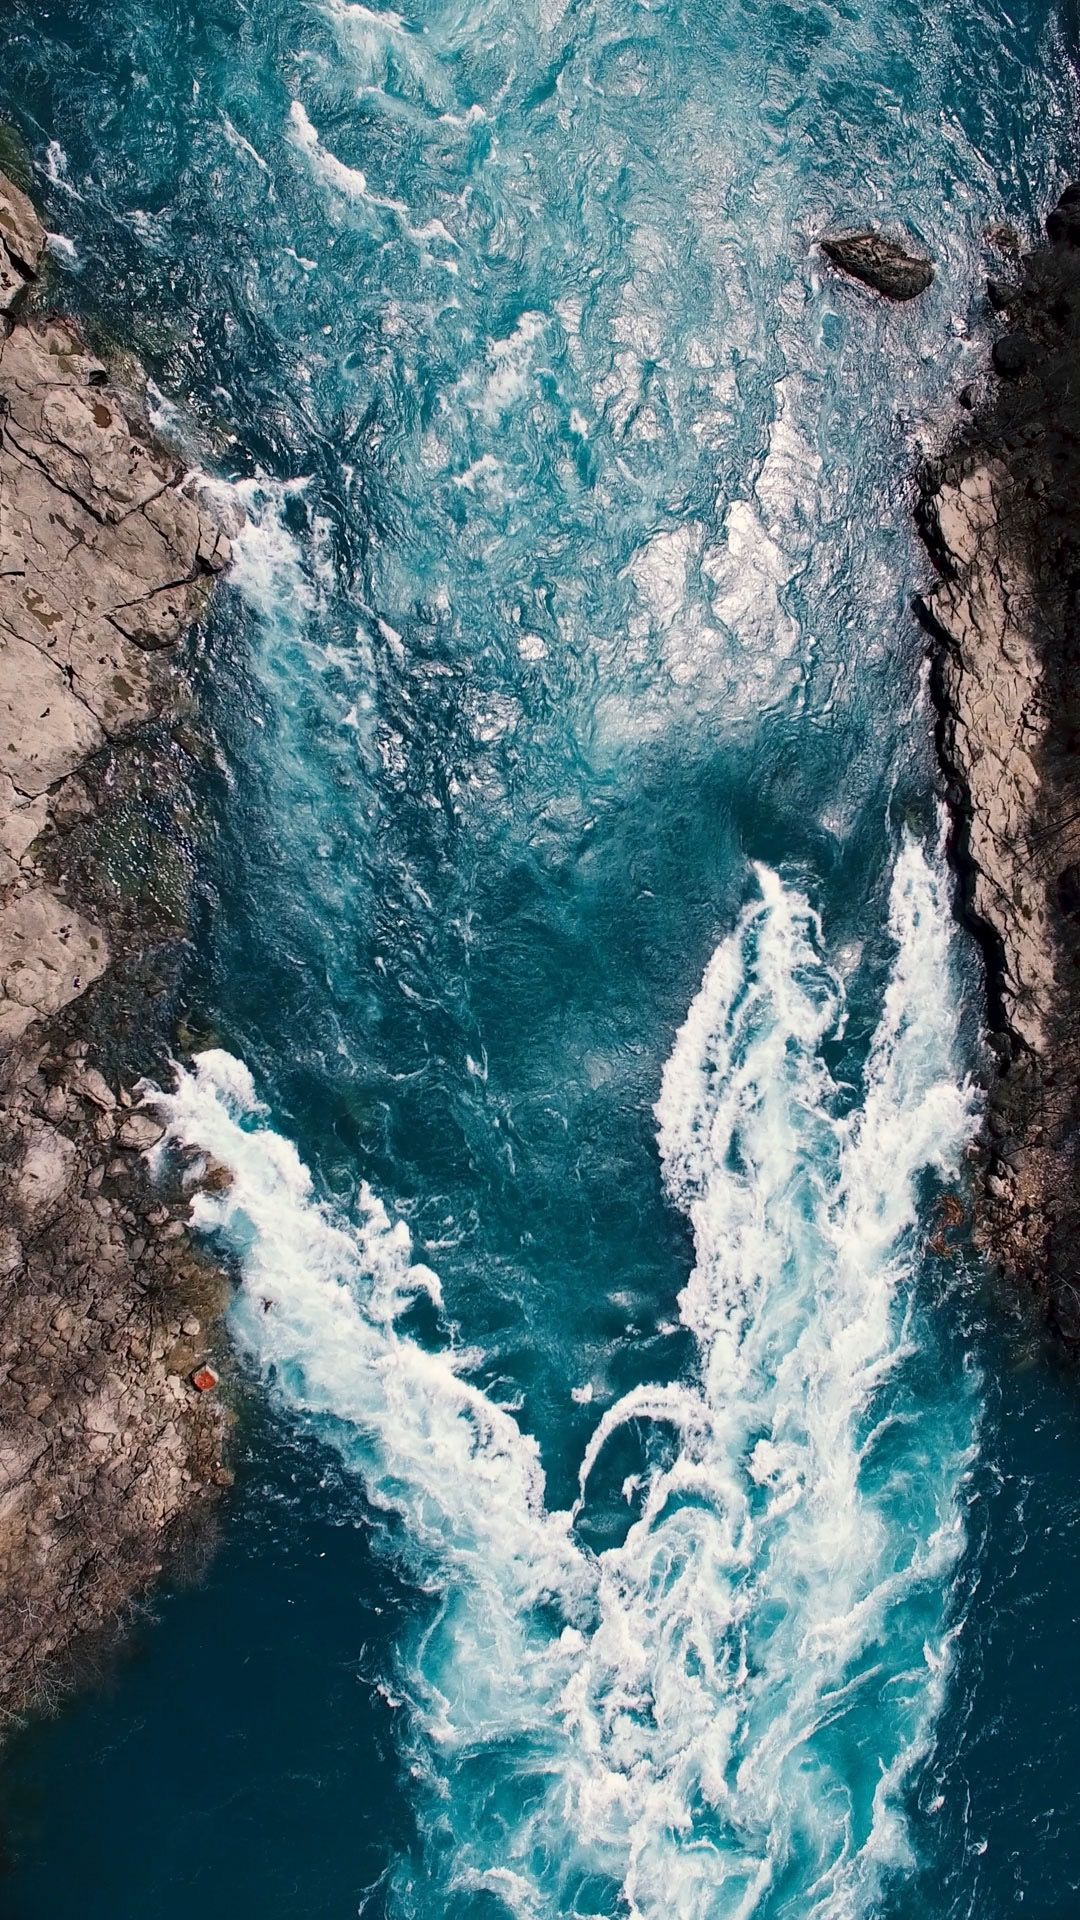 Nature live wallpaper | Ocean wallpaper, Beautiful live ...